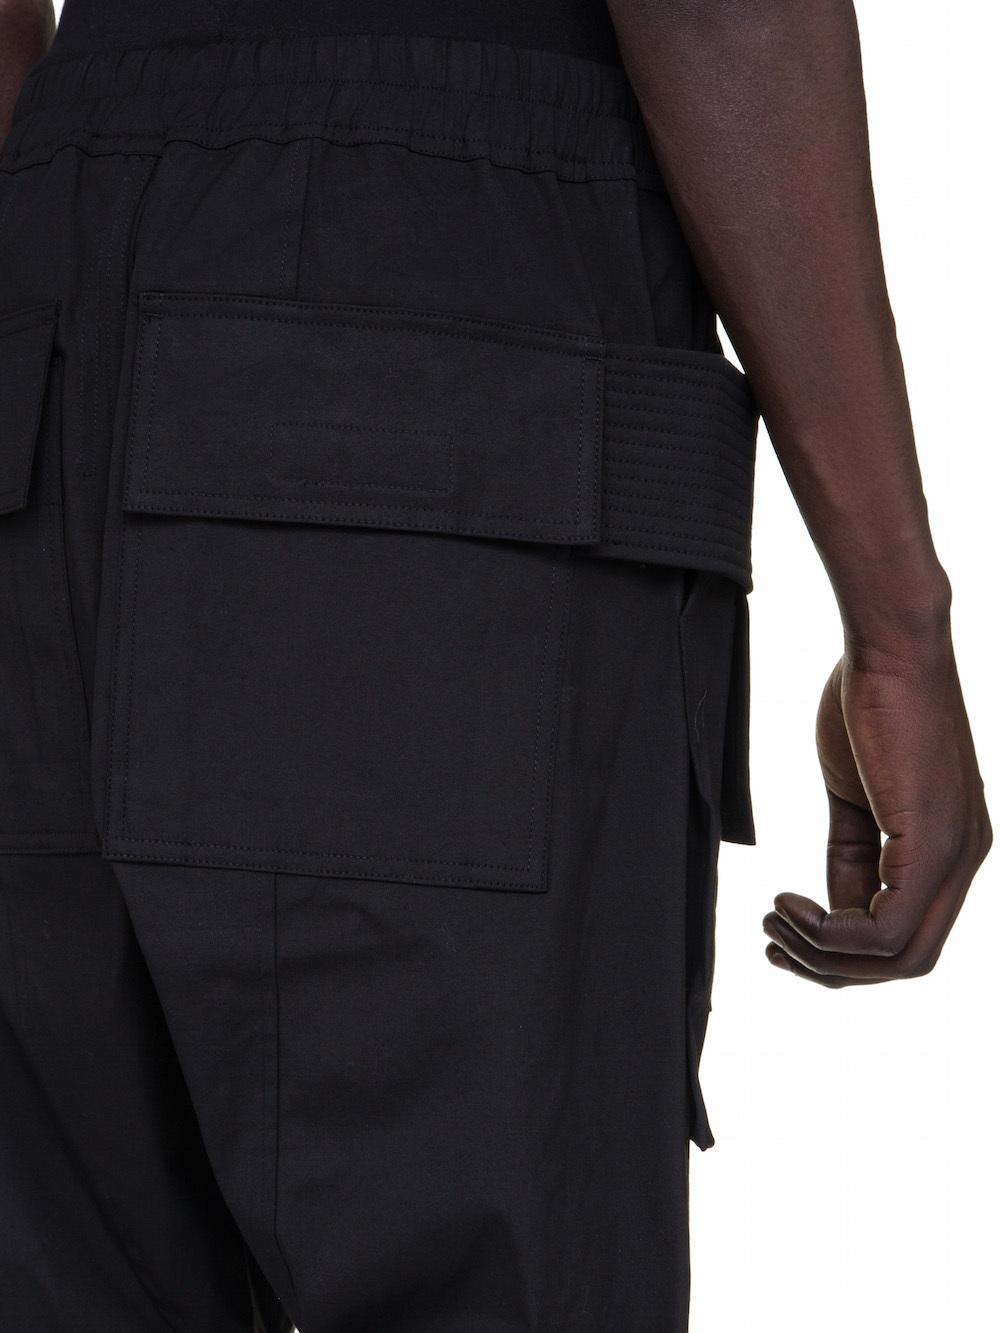 DRKSHDW FW18 SISYPHUS CREATCH CARGO PANTS IN BLACK